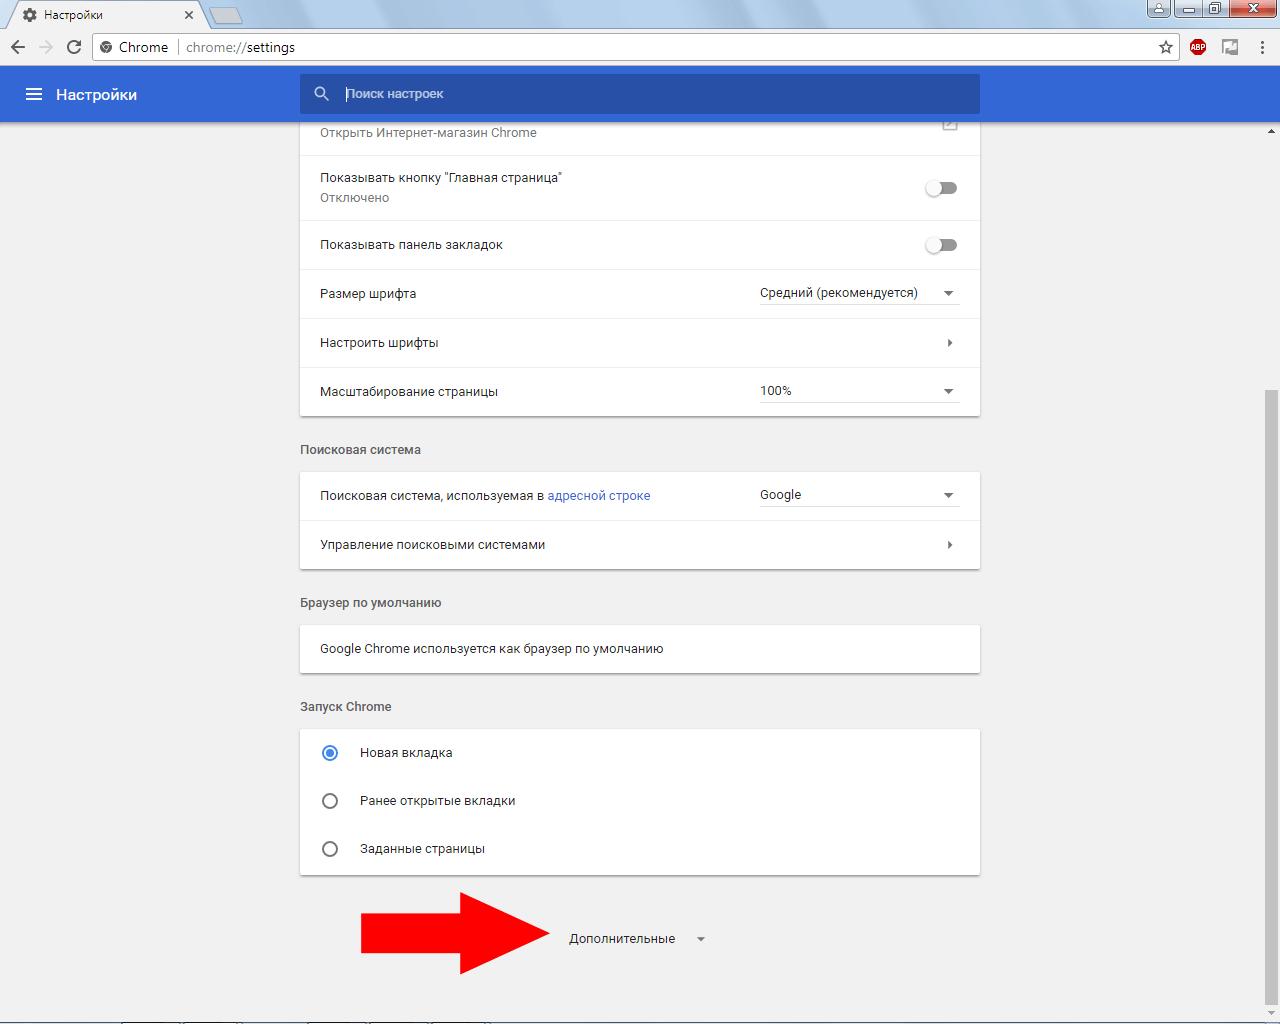 Как назначить Chrome браузером по умолчанию - Android 35